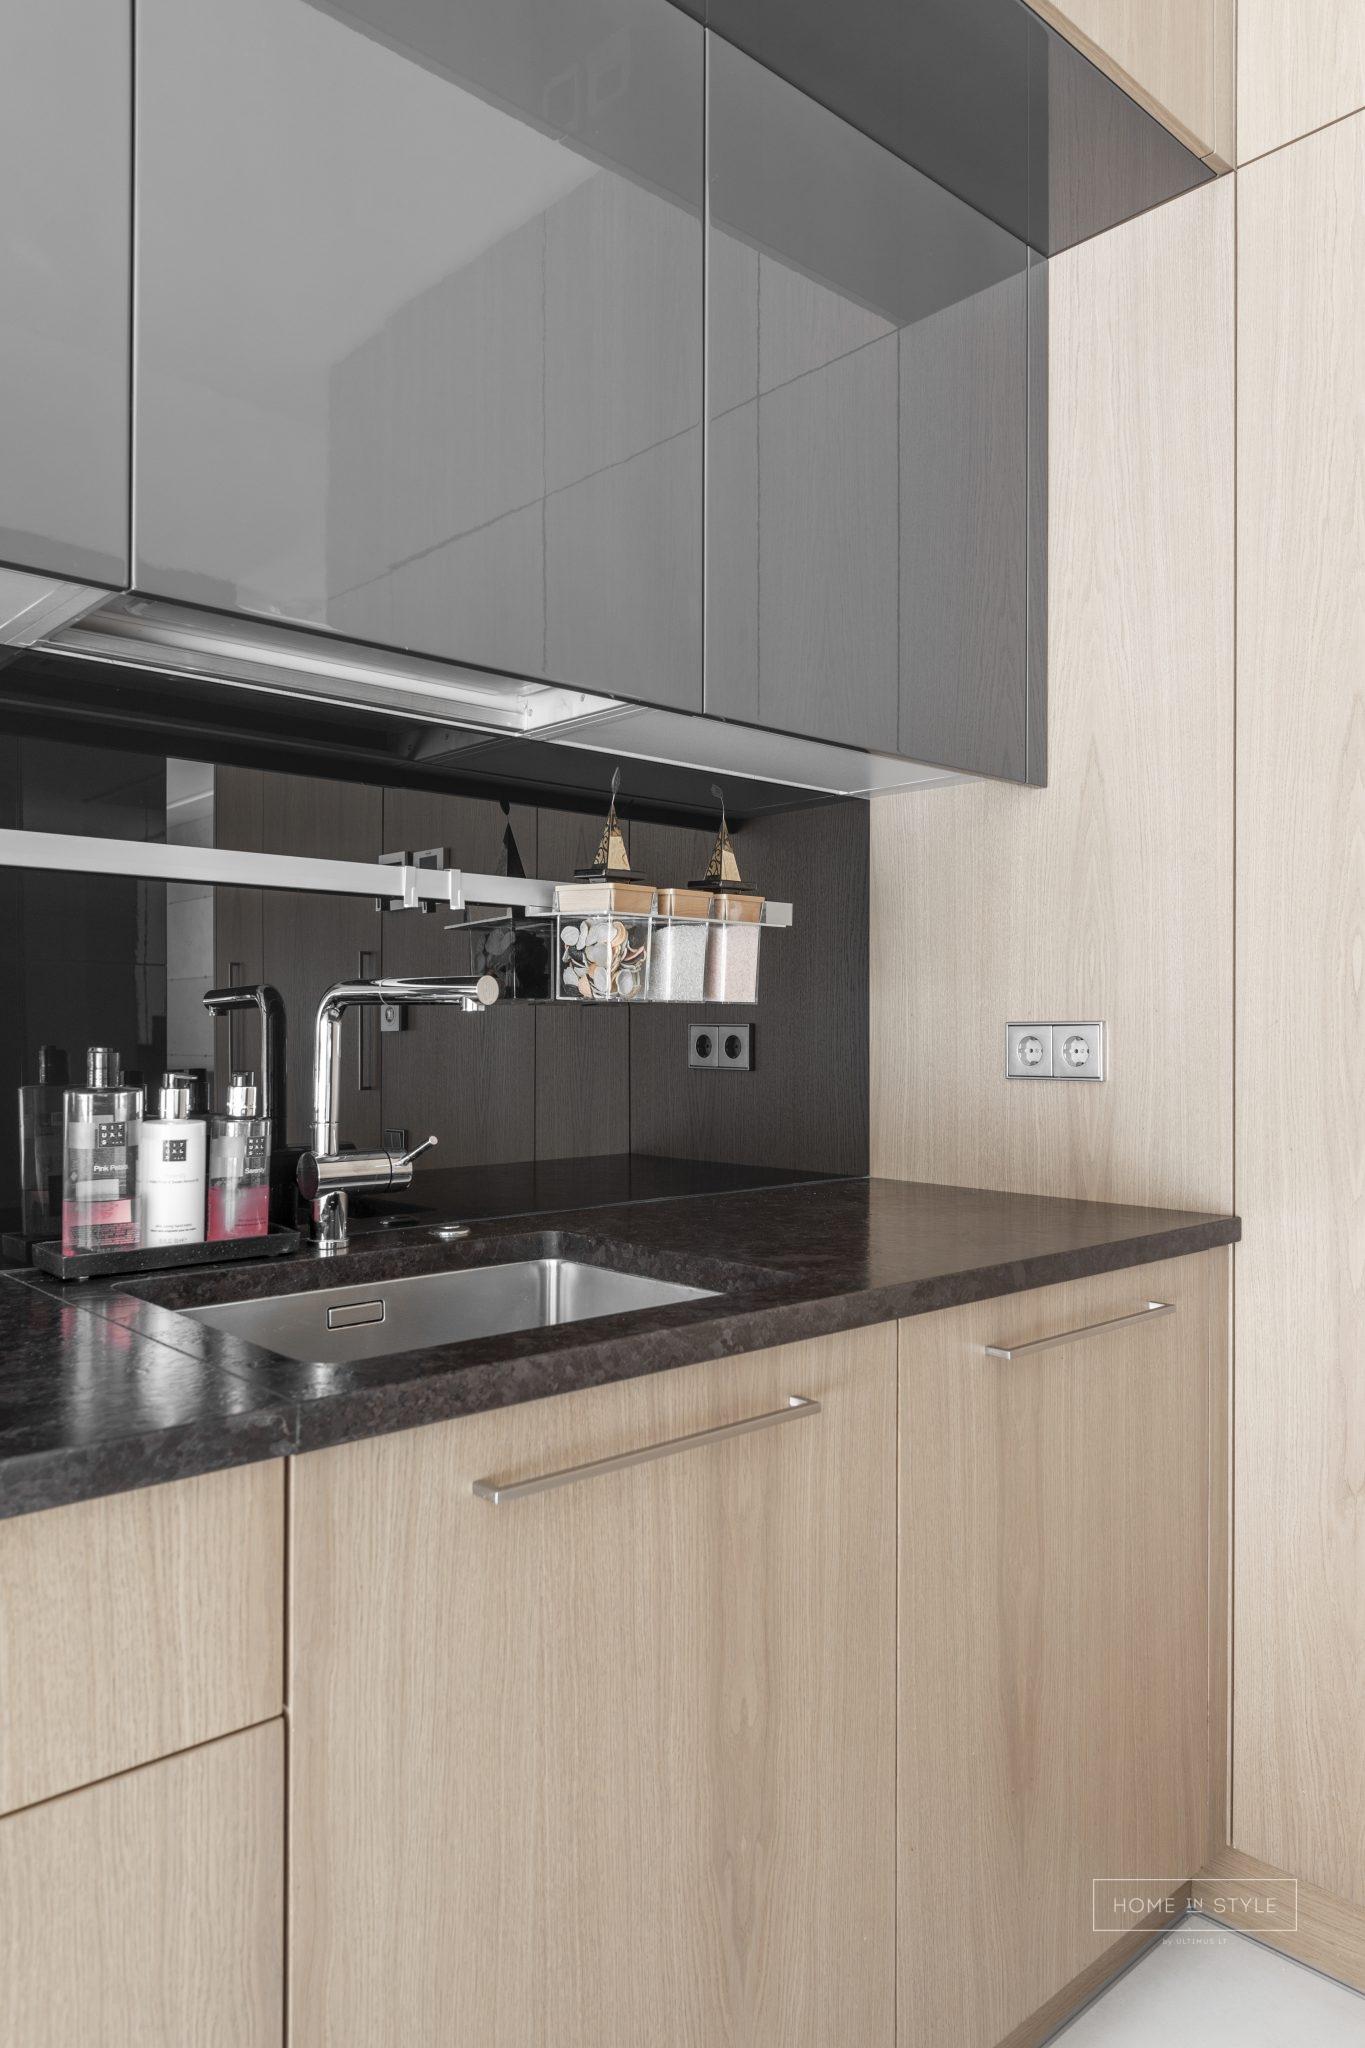 Stilingu virtuves baldu gamyba pagal individualius uzsakymus